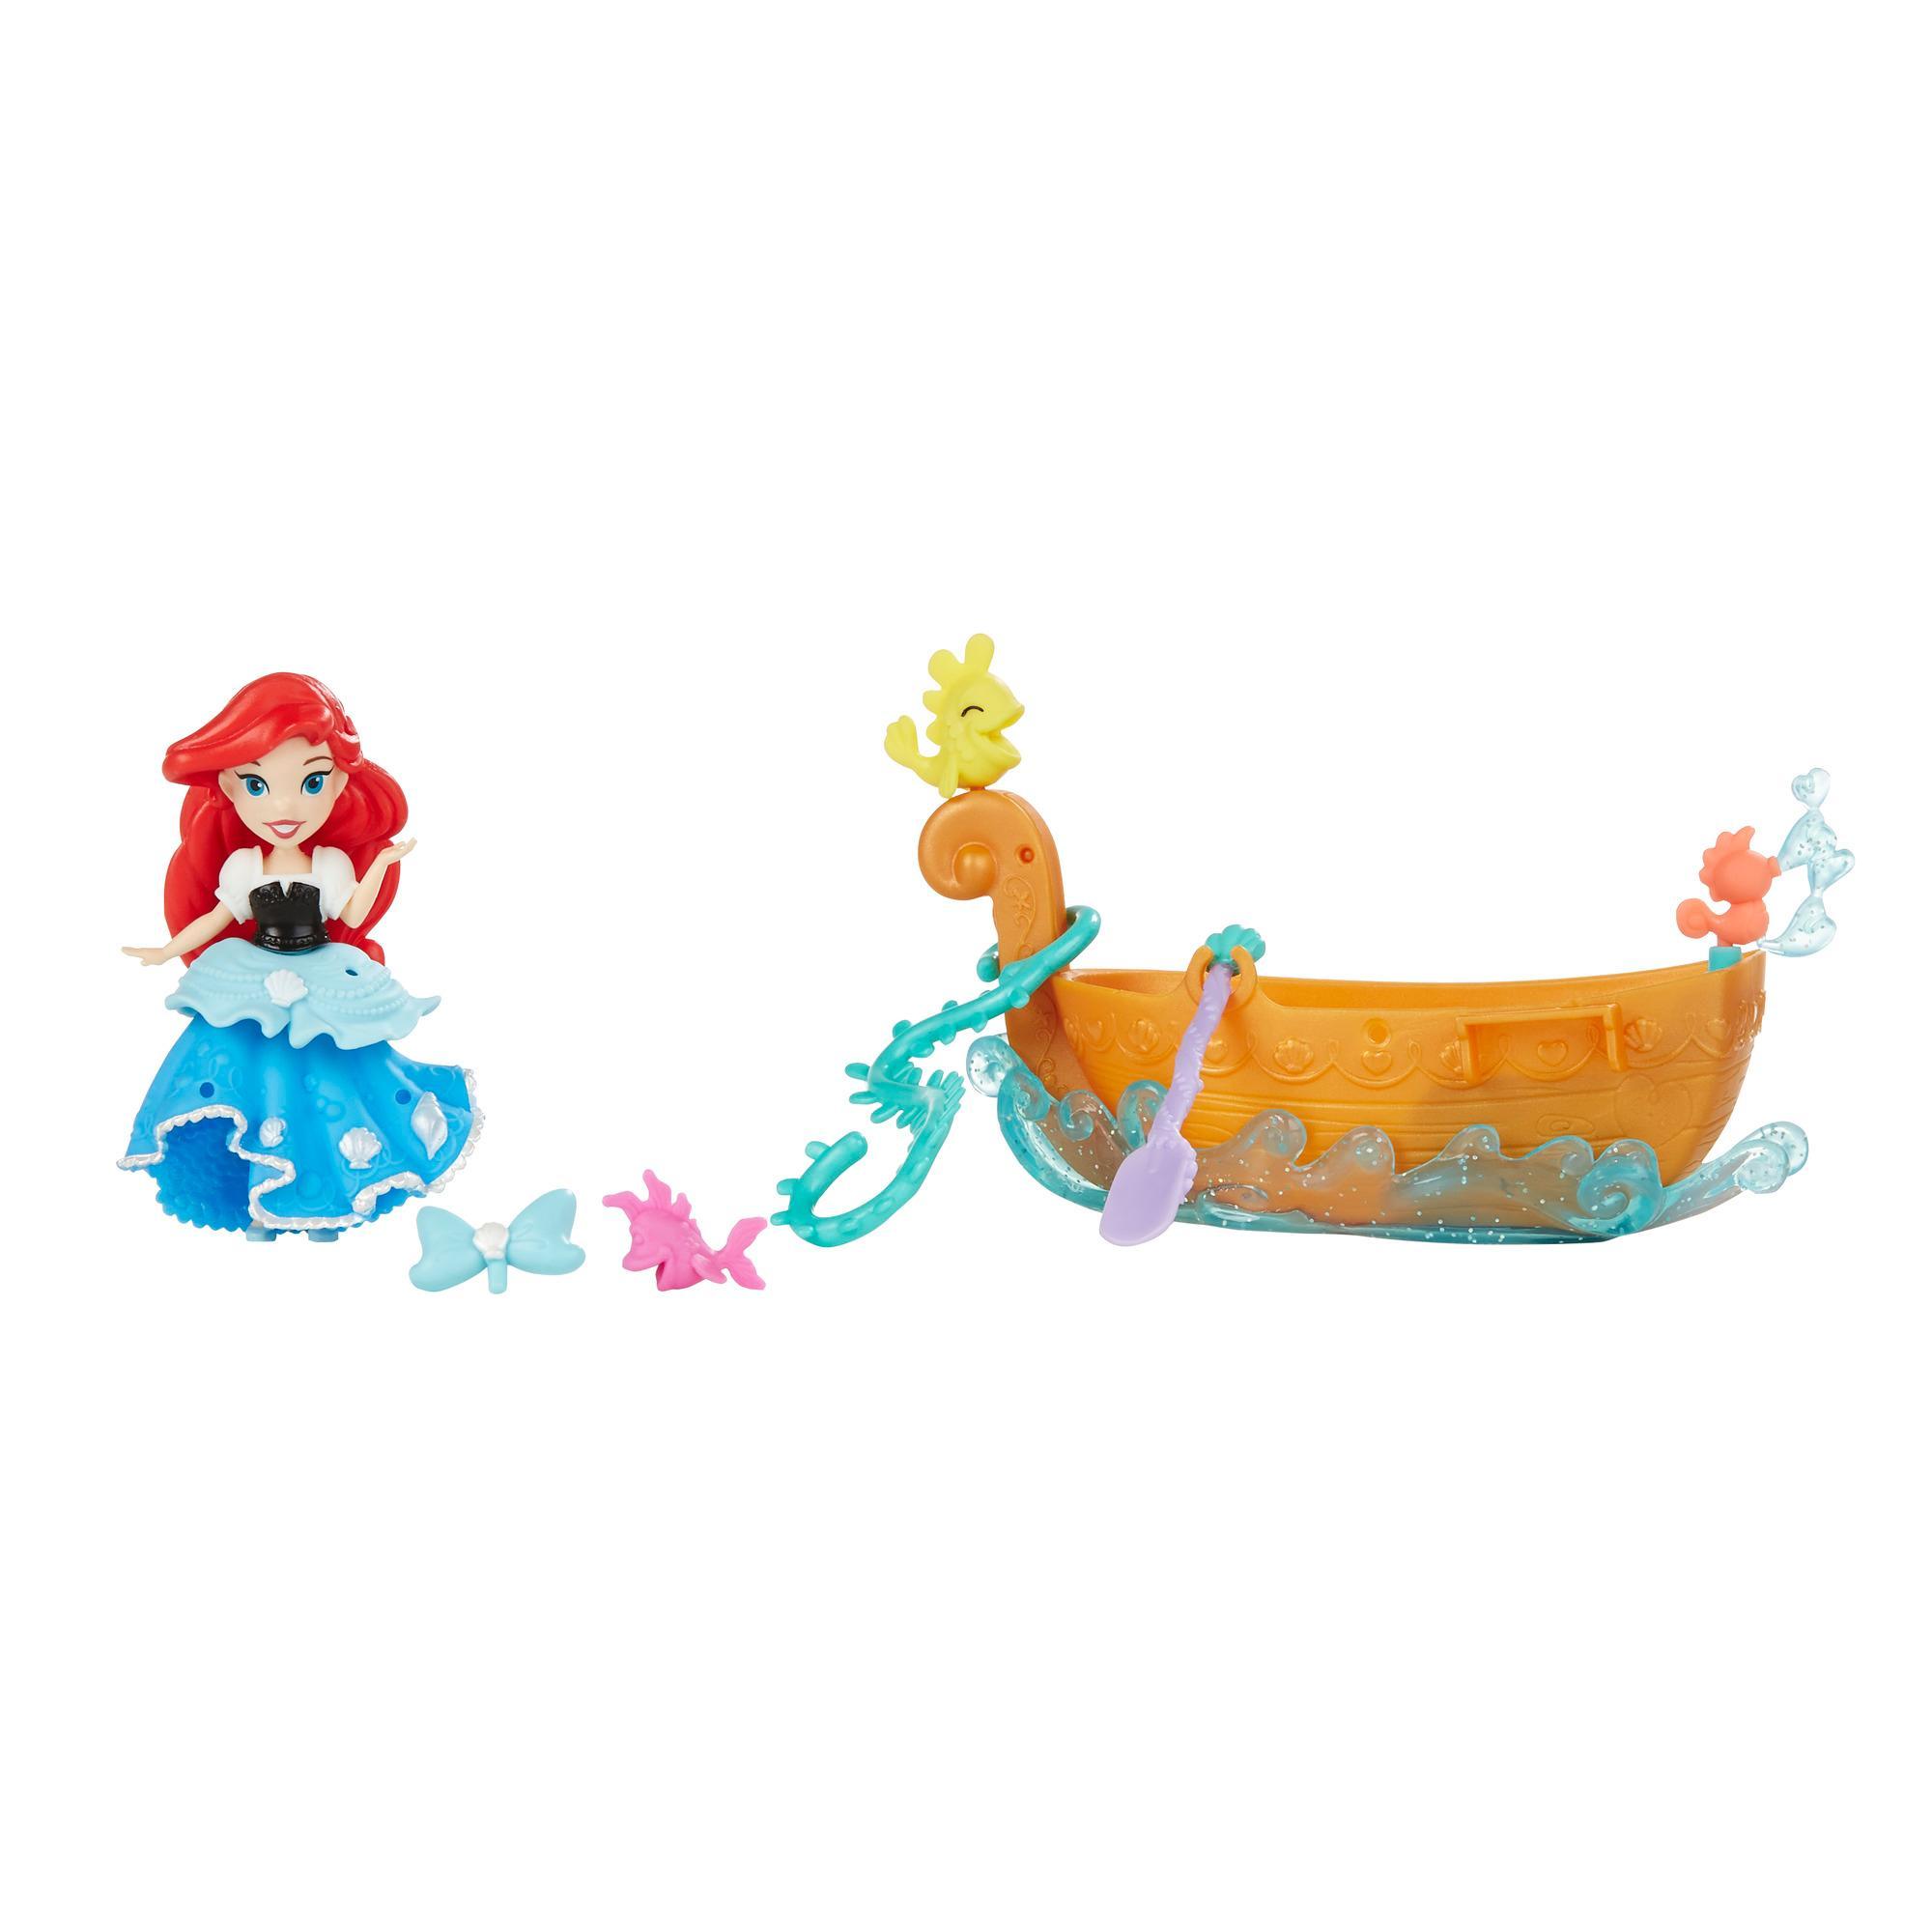 Disney Princess Little Kingdom Ariel's Floating Dreams Boat